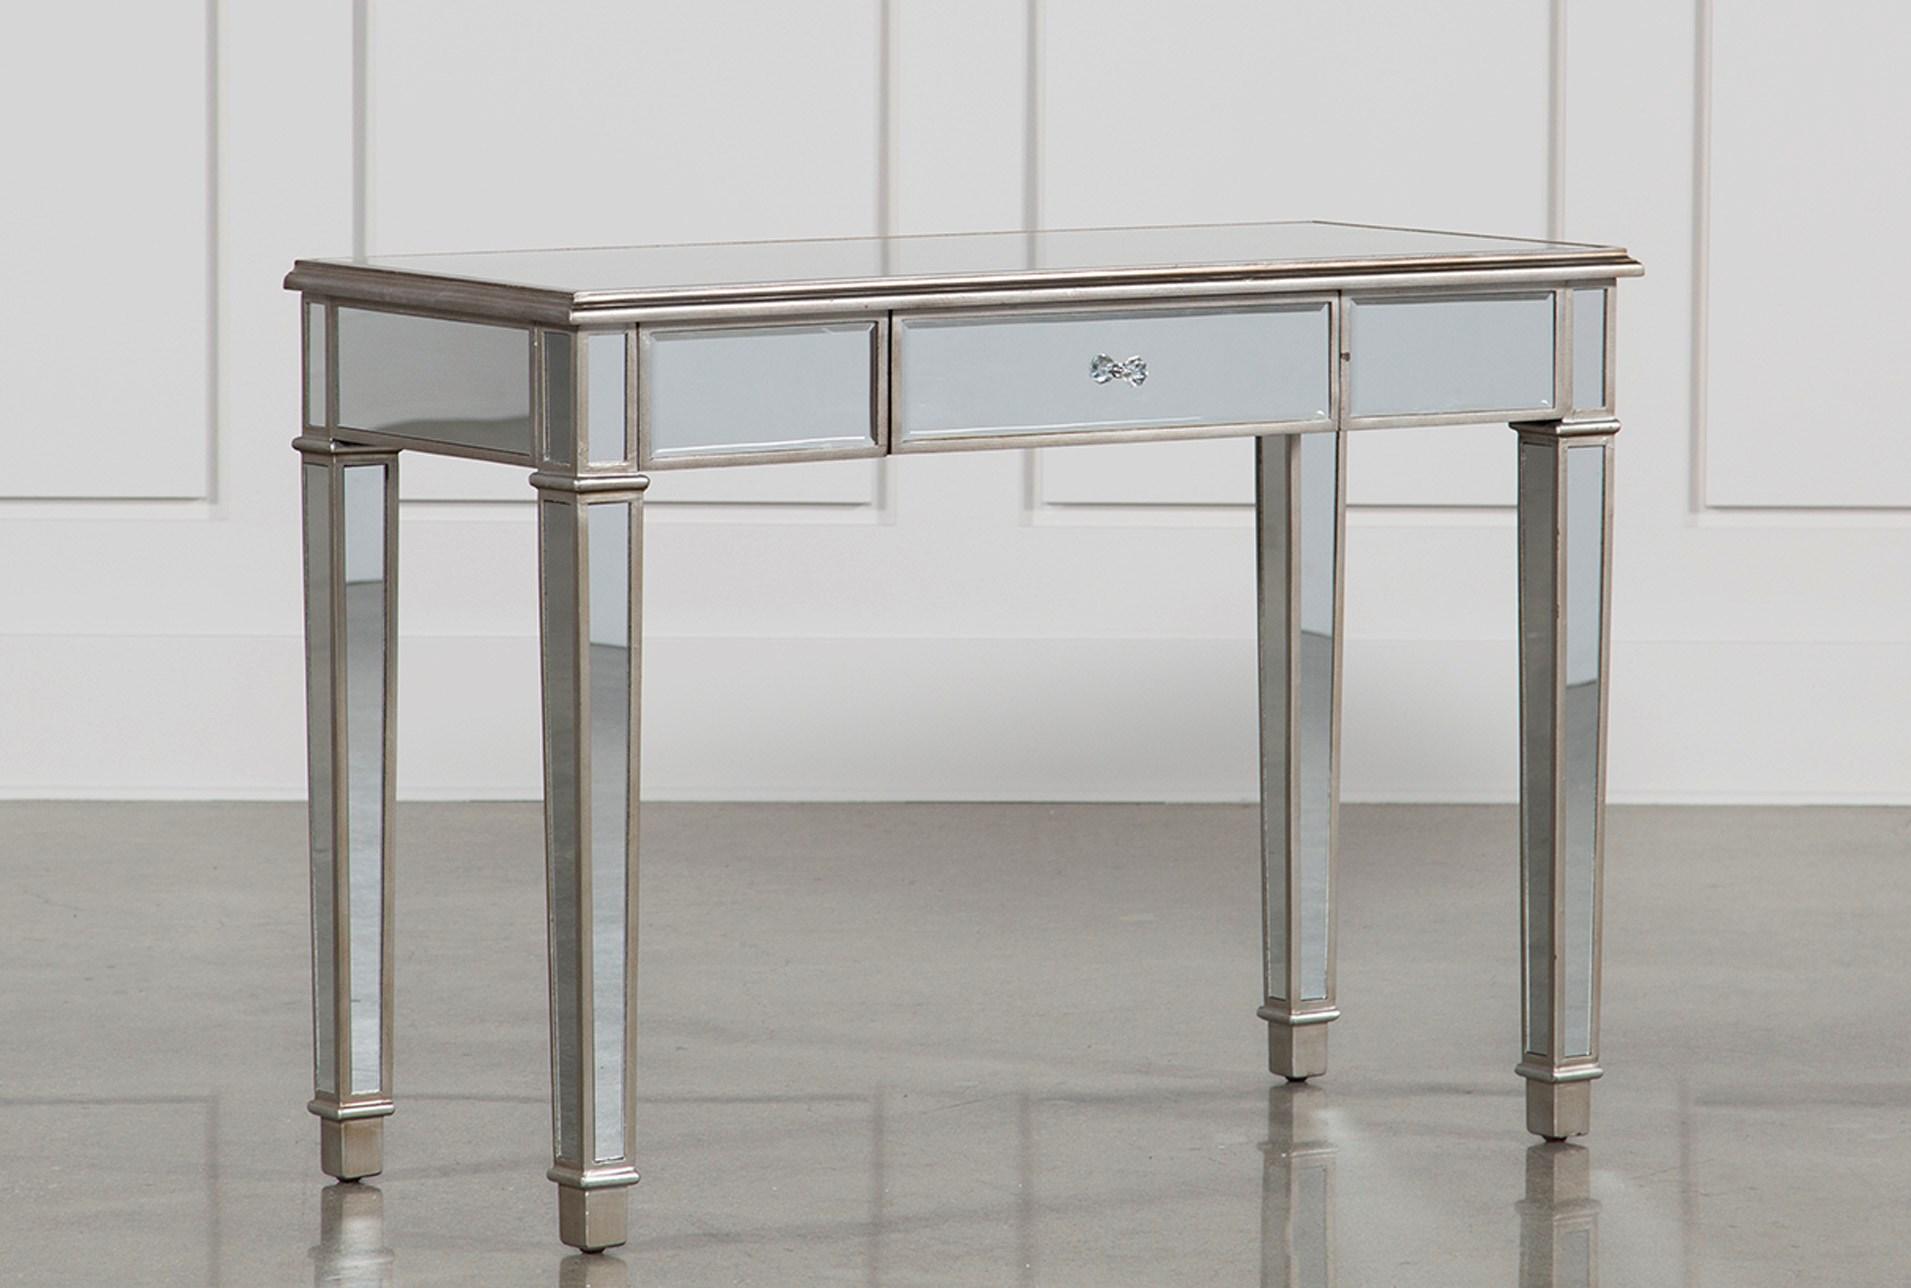 hayworth mirrored furniture. Hayworth Mirrored Vanity Desk - 360 Furniture U